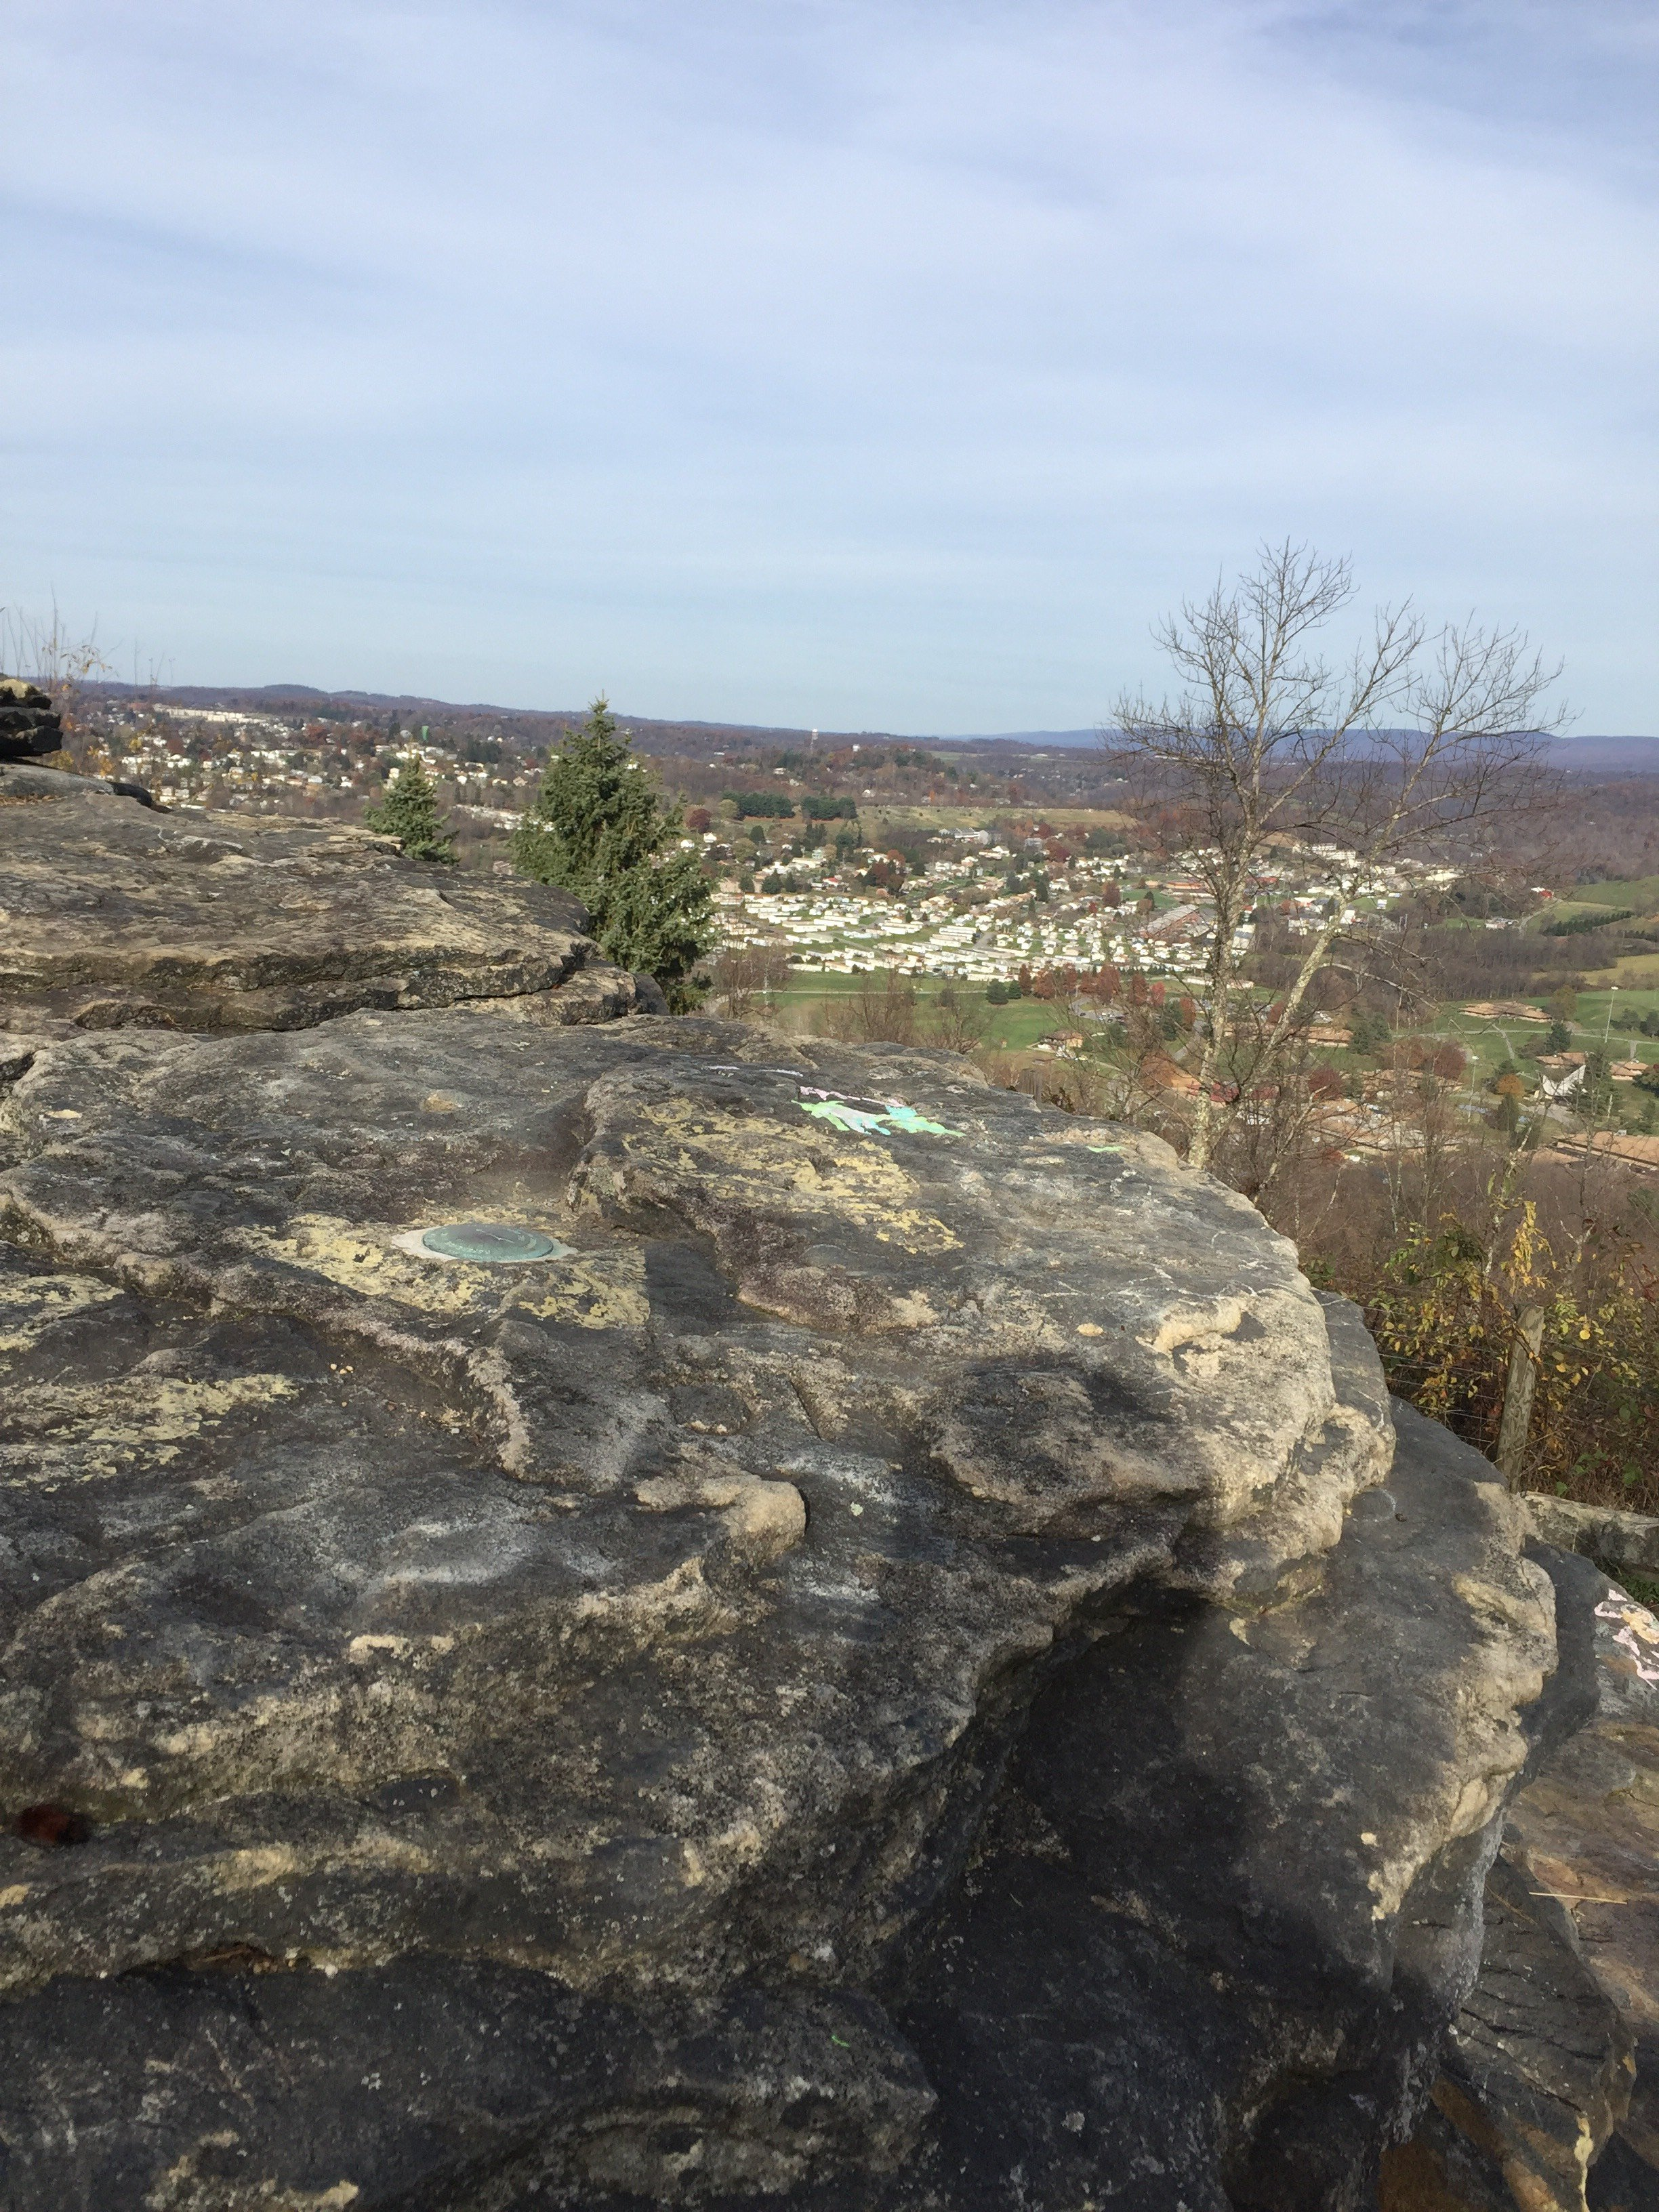 View from Sky Rock. Photo taken November 11, 2017.